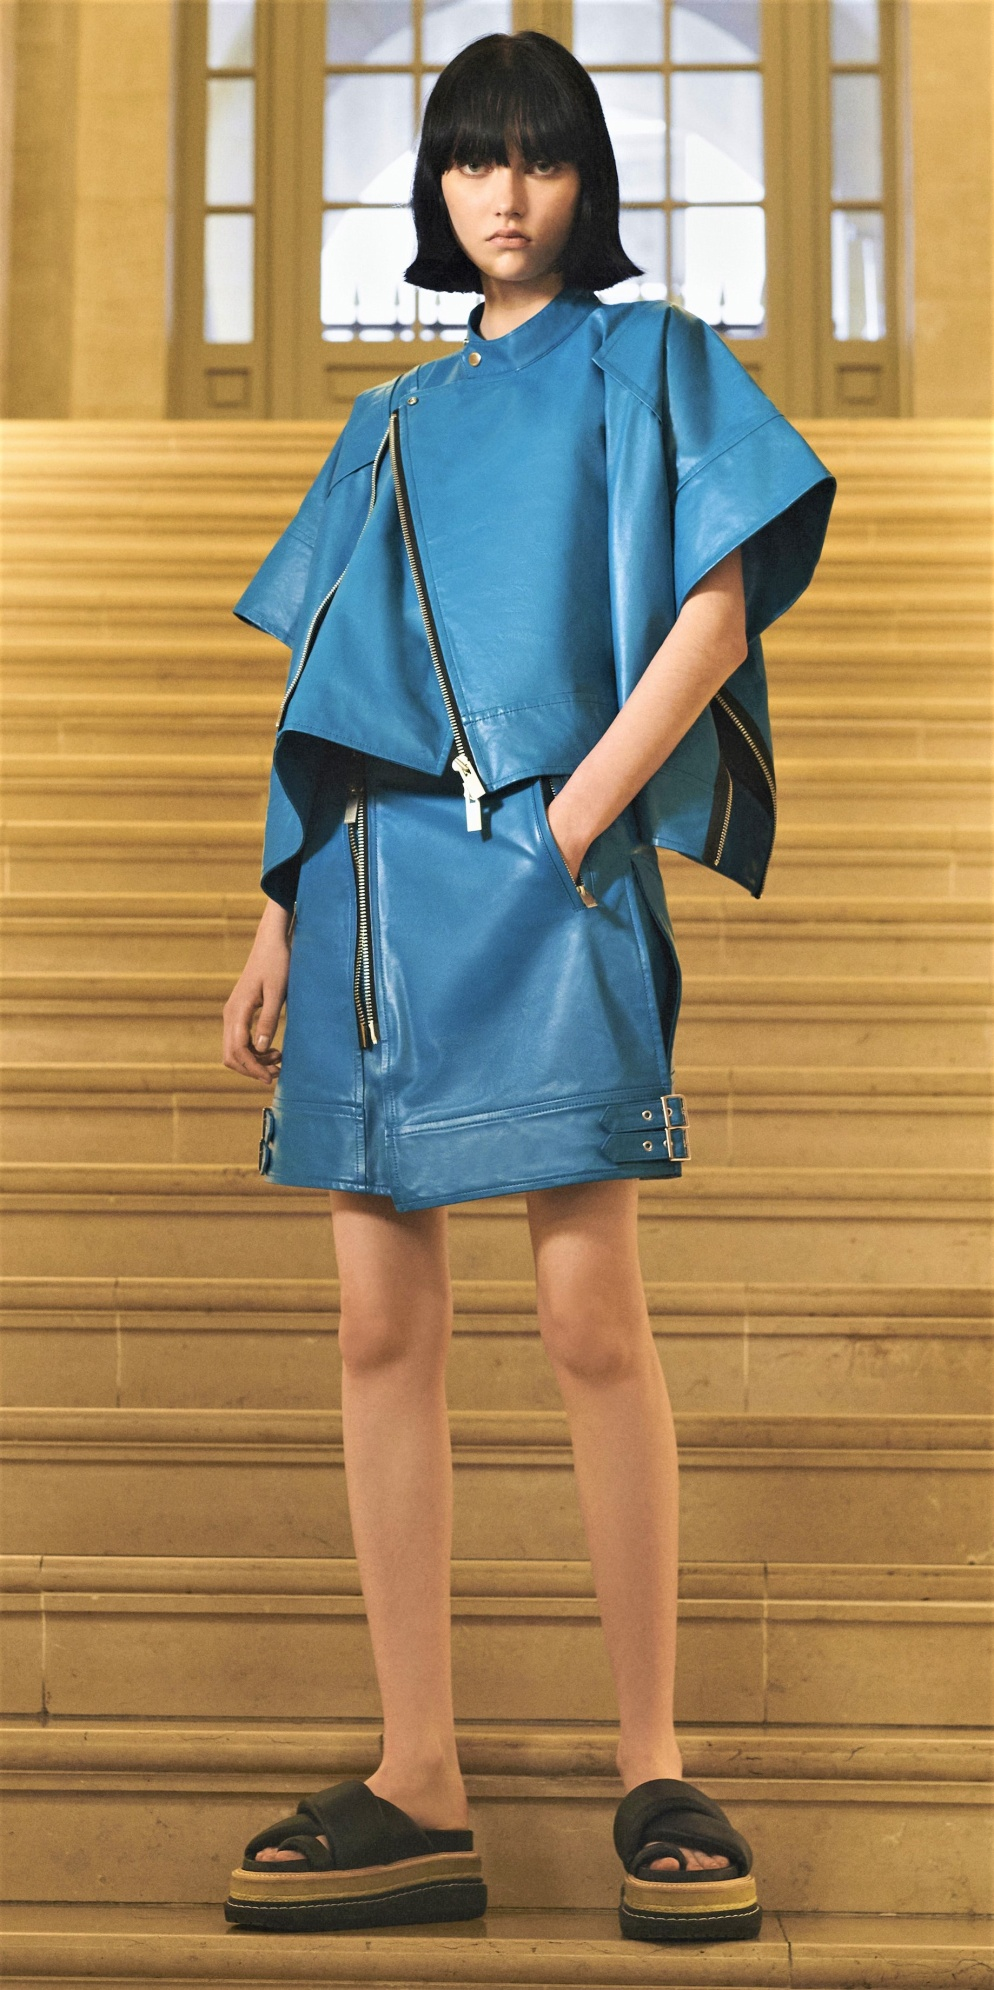 Sacair 8-21 resort blue leather cropped.jpg